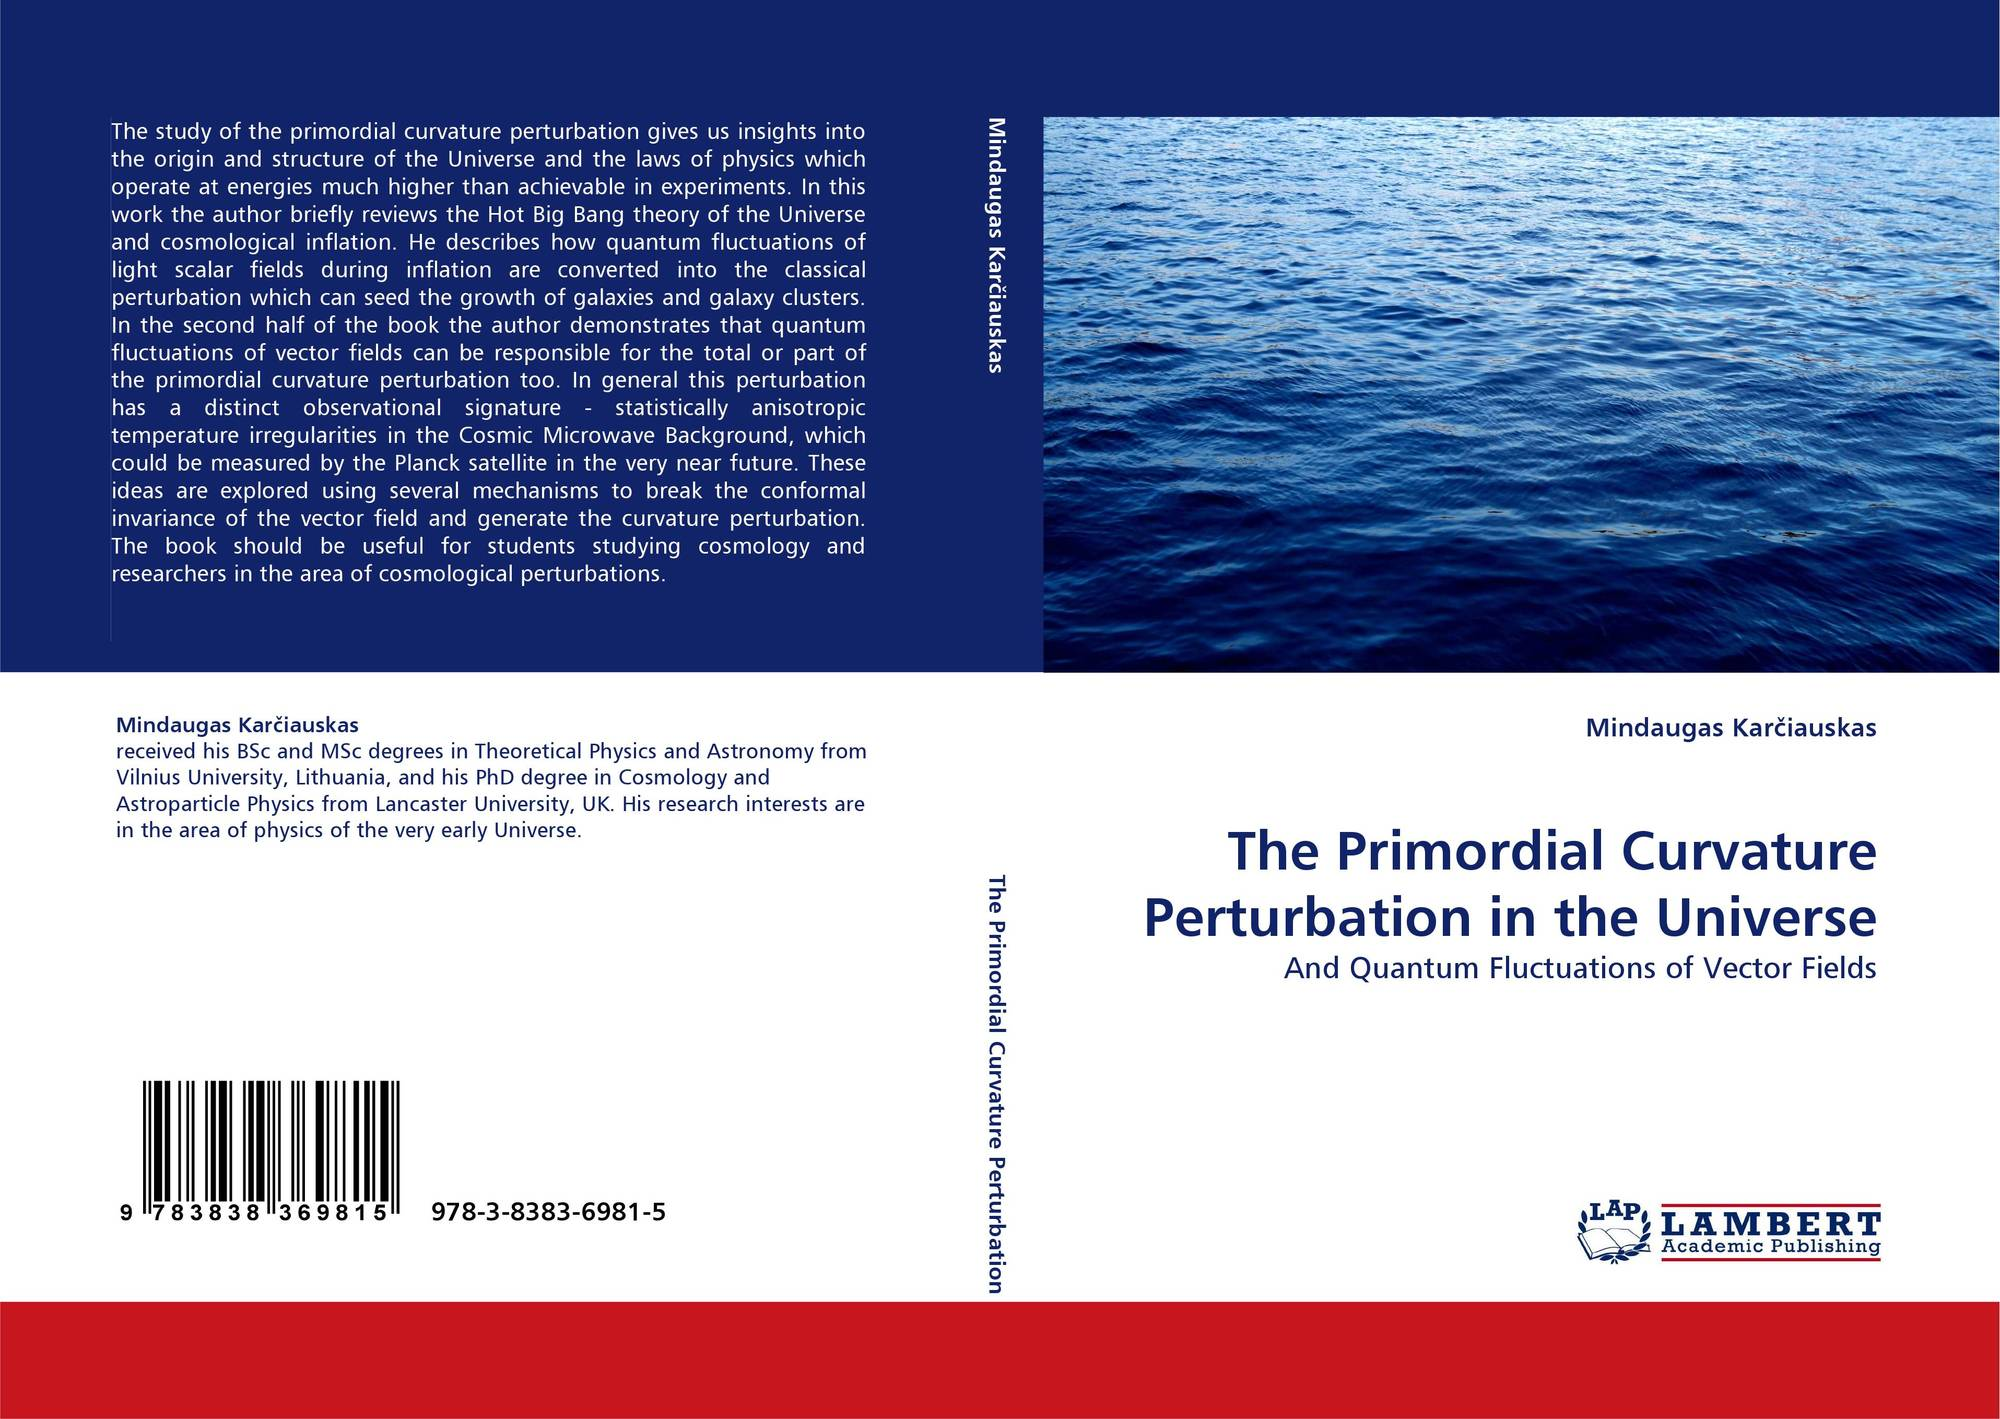 The Primordial Curvature Perturbation in the Universe, 978-3